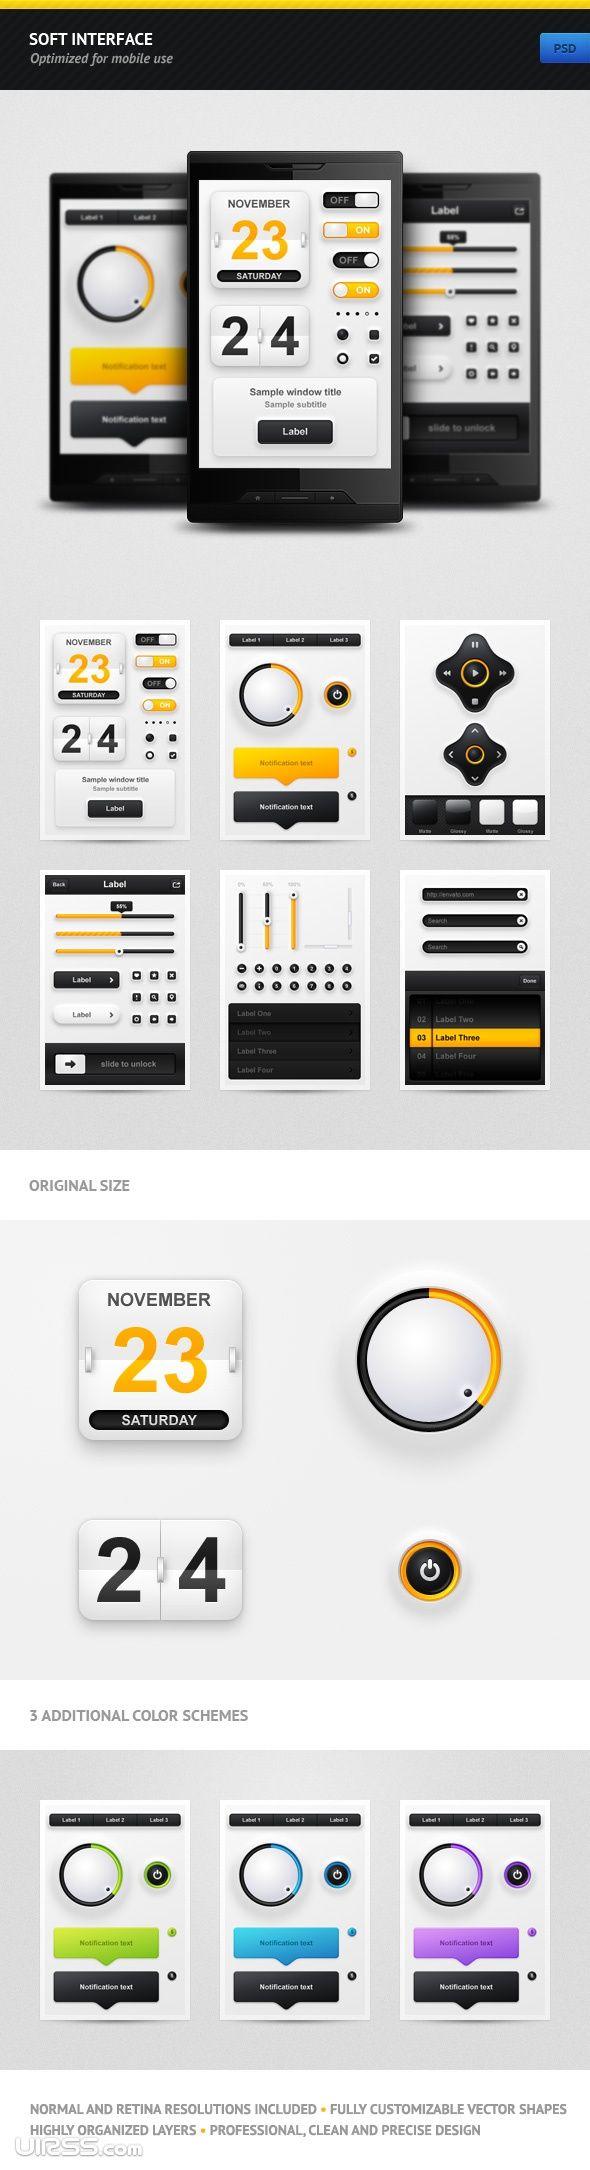 Interface elements for mobile -: Iphone App, Ui Design, Graphics Design Illustrations, Interfacedesign, Mobiles Design, User Interface, Interface Design, Soft Interface, App Design